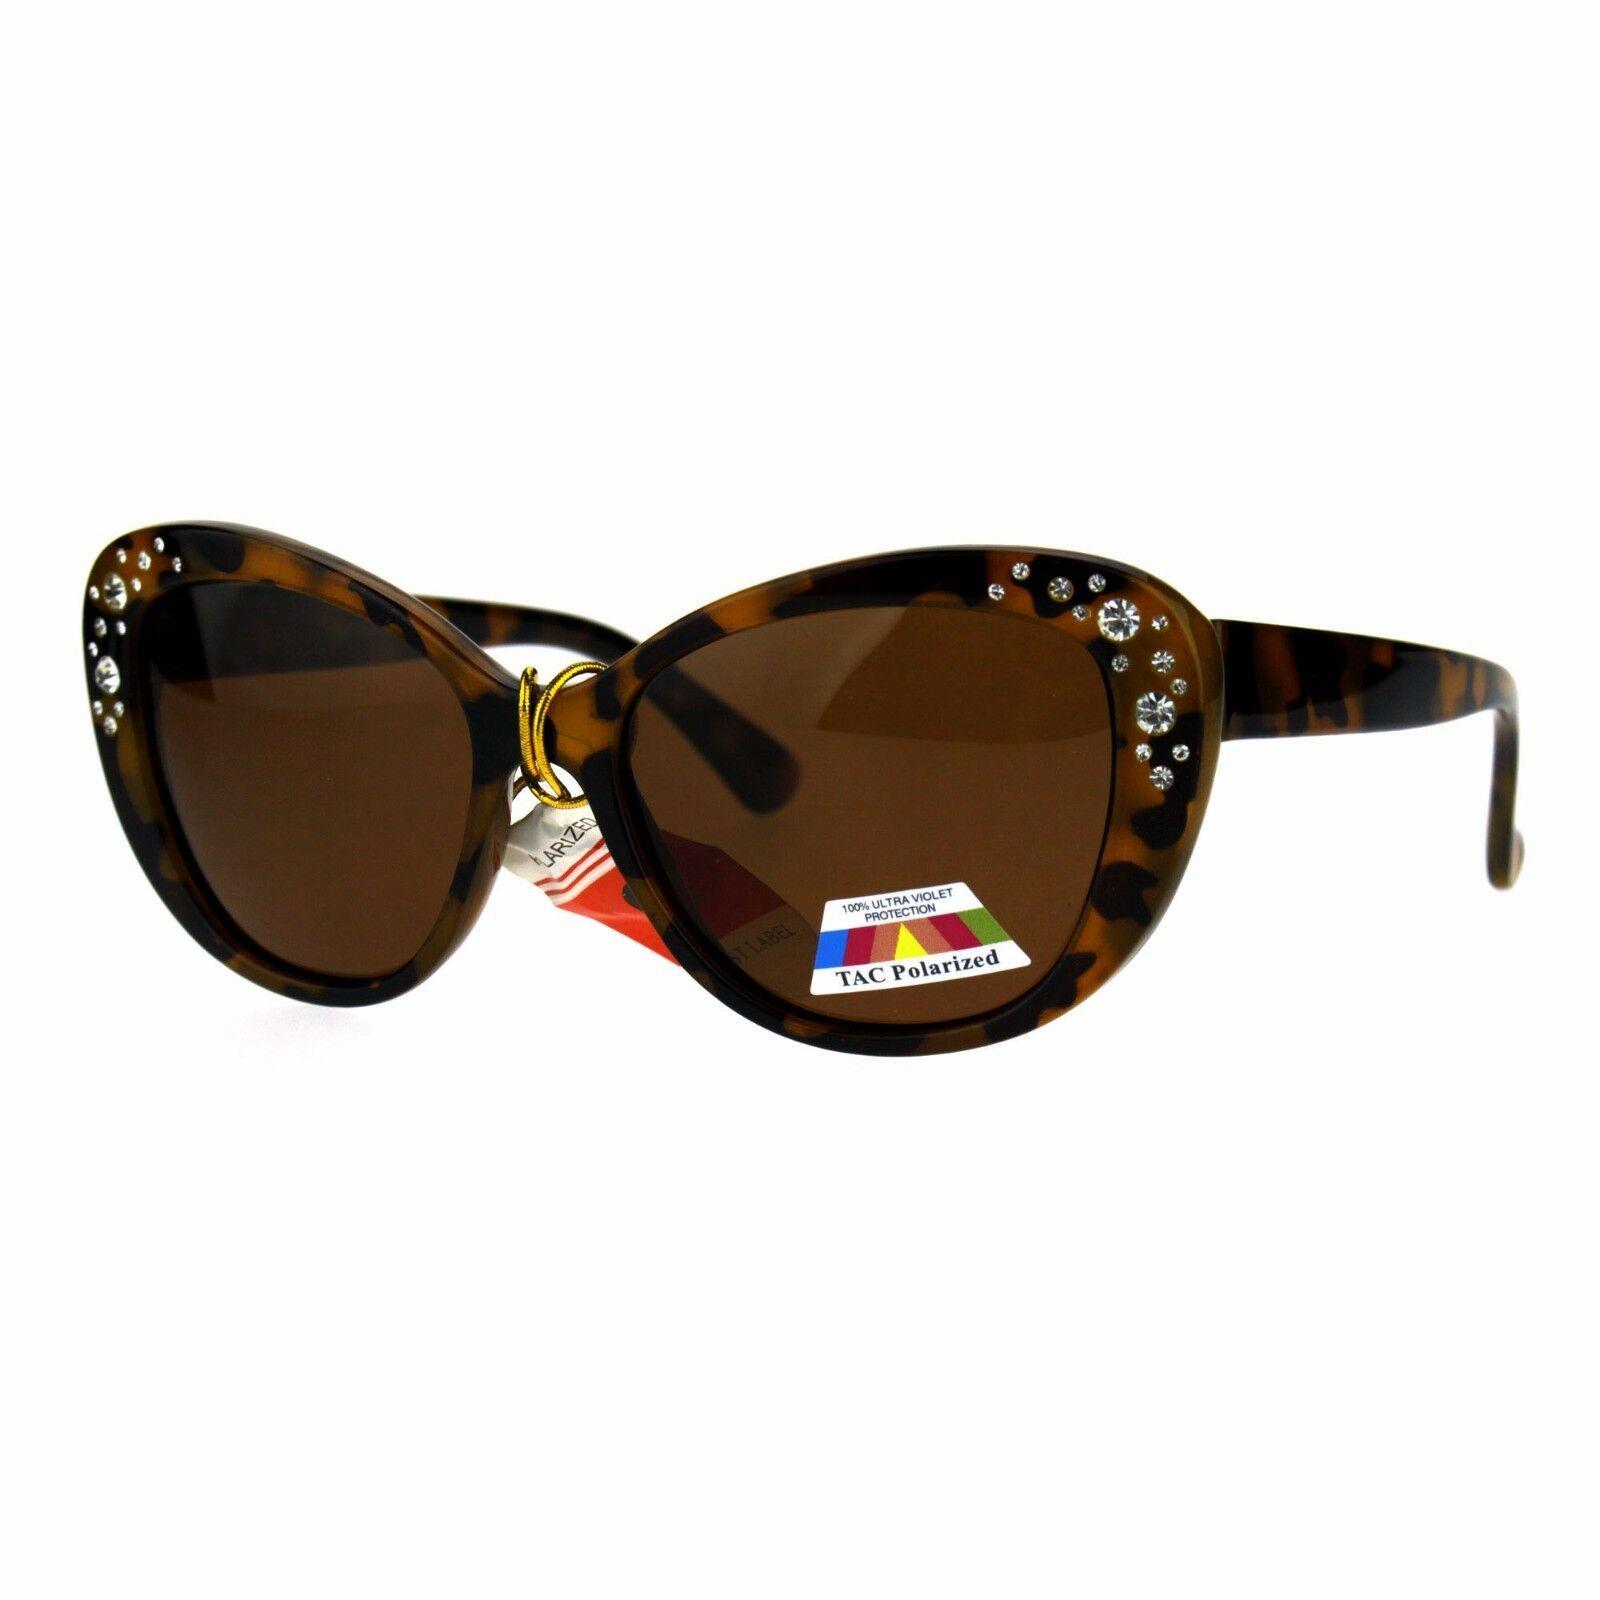 Womens Polarized Lens Sunglasses Rhinestone Design Cateye Butterfly Frame